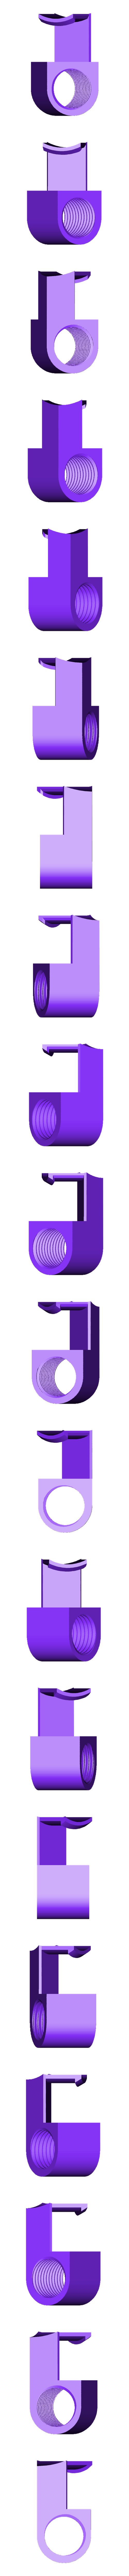 frame_tensioner_V2-2.stl Télécharger fichier STL gratuit Anet (A8) ultimate frame tensioners (absorbeurs de vibrations et de bruit) • Design à imprimer en 3D, EnginEli